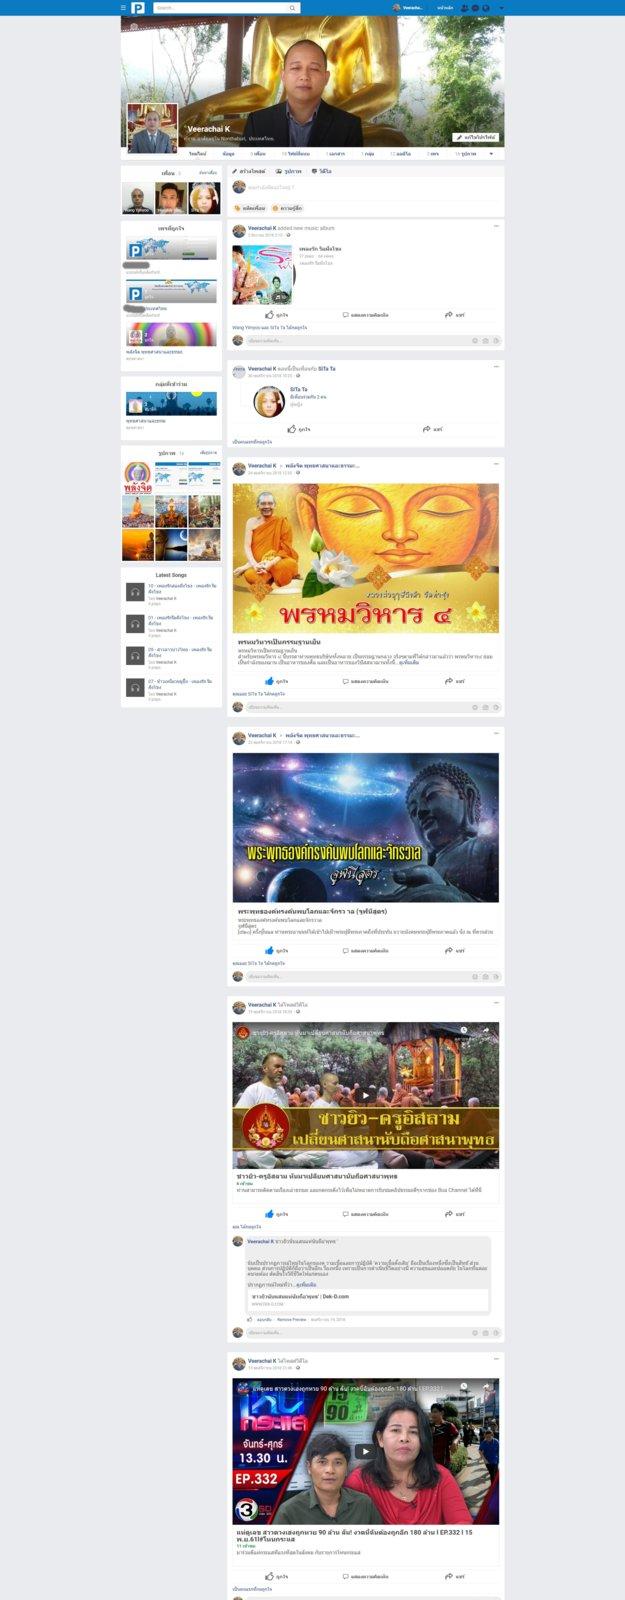 Screenshot_2018-12-25 Veerachai K - ผู้ชาย - ประเทศไทย.jpg